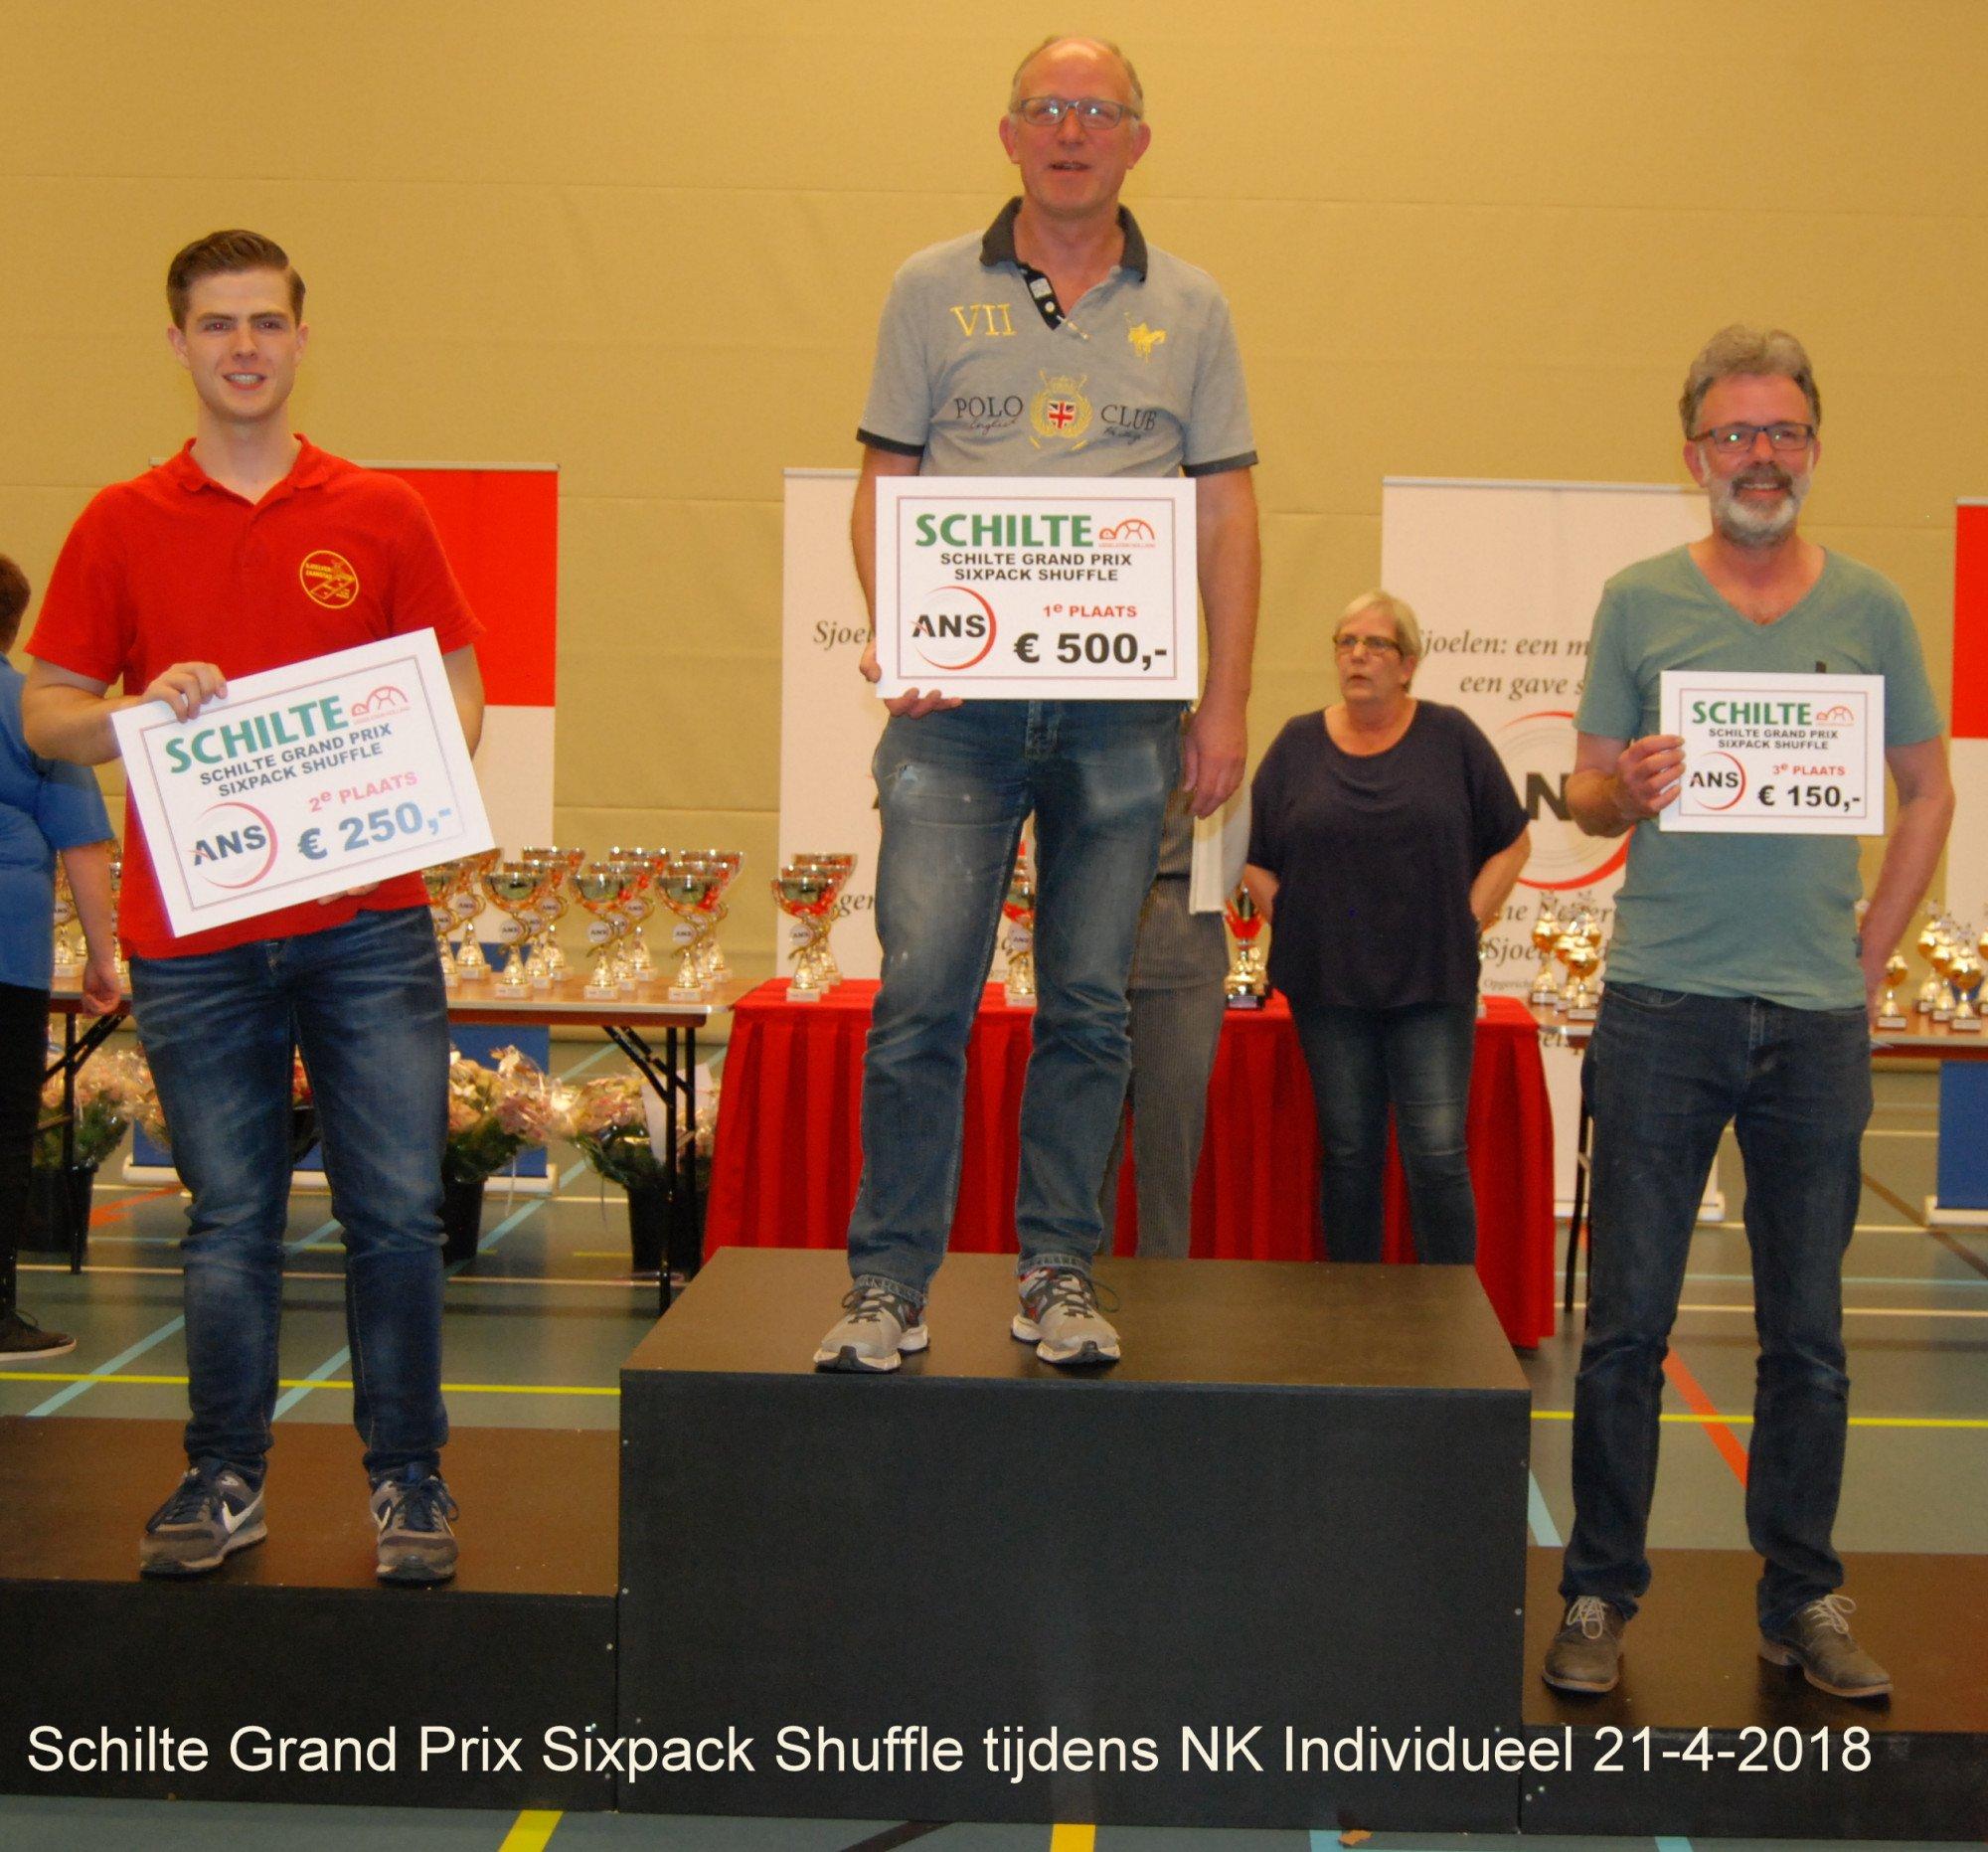 1. Schilte Grand Prix Sixpack Shuffle 21-4-2018